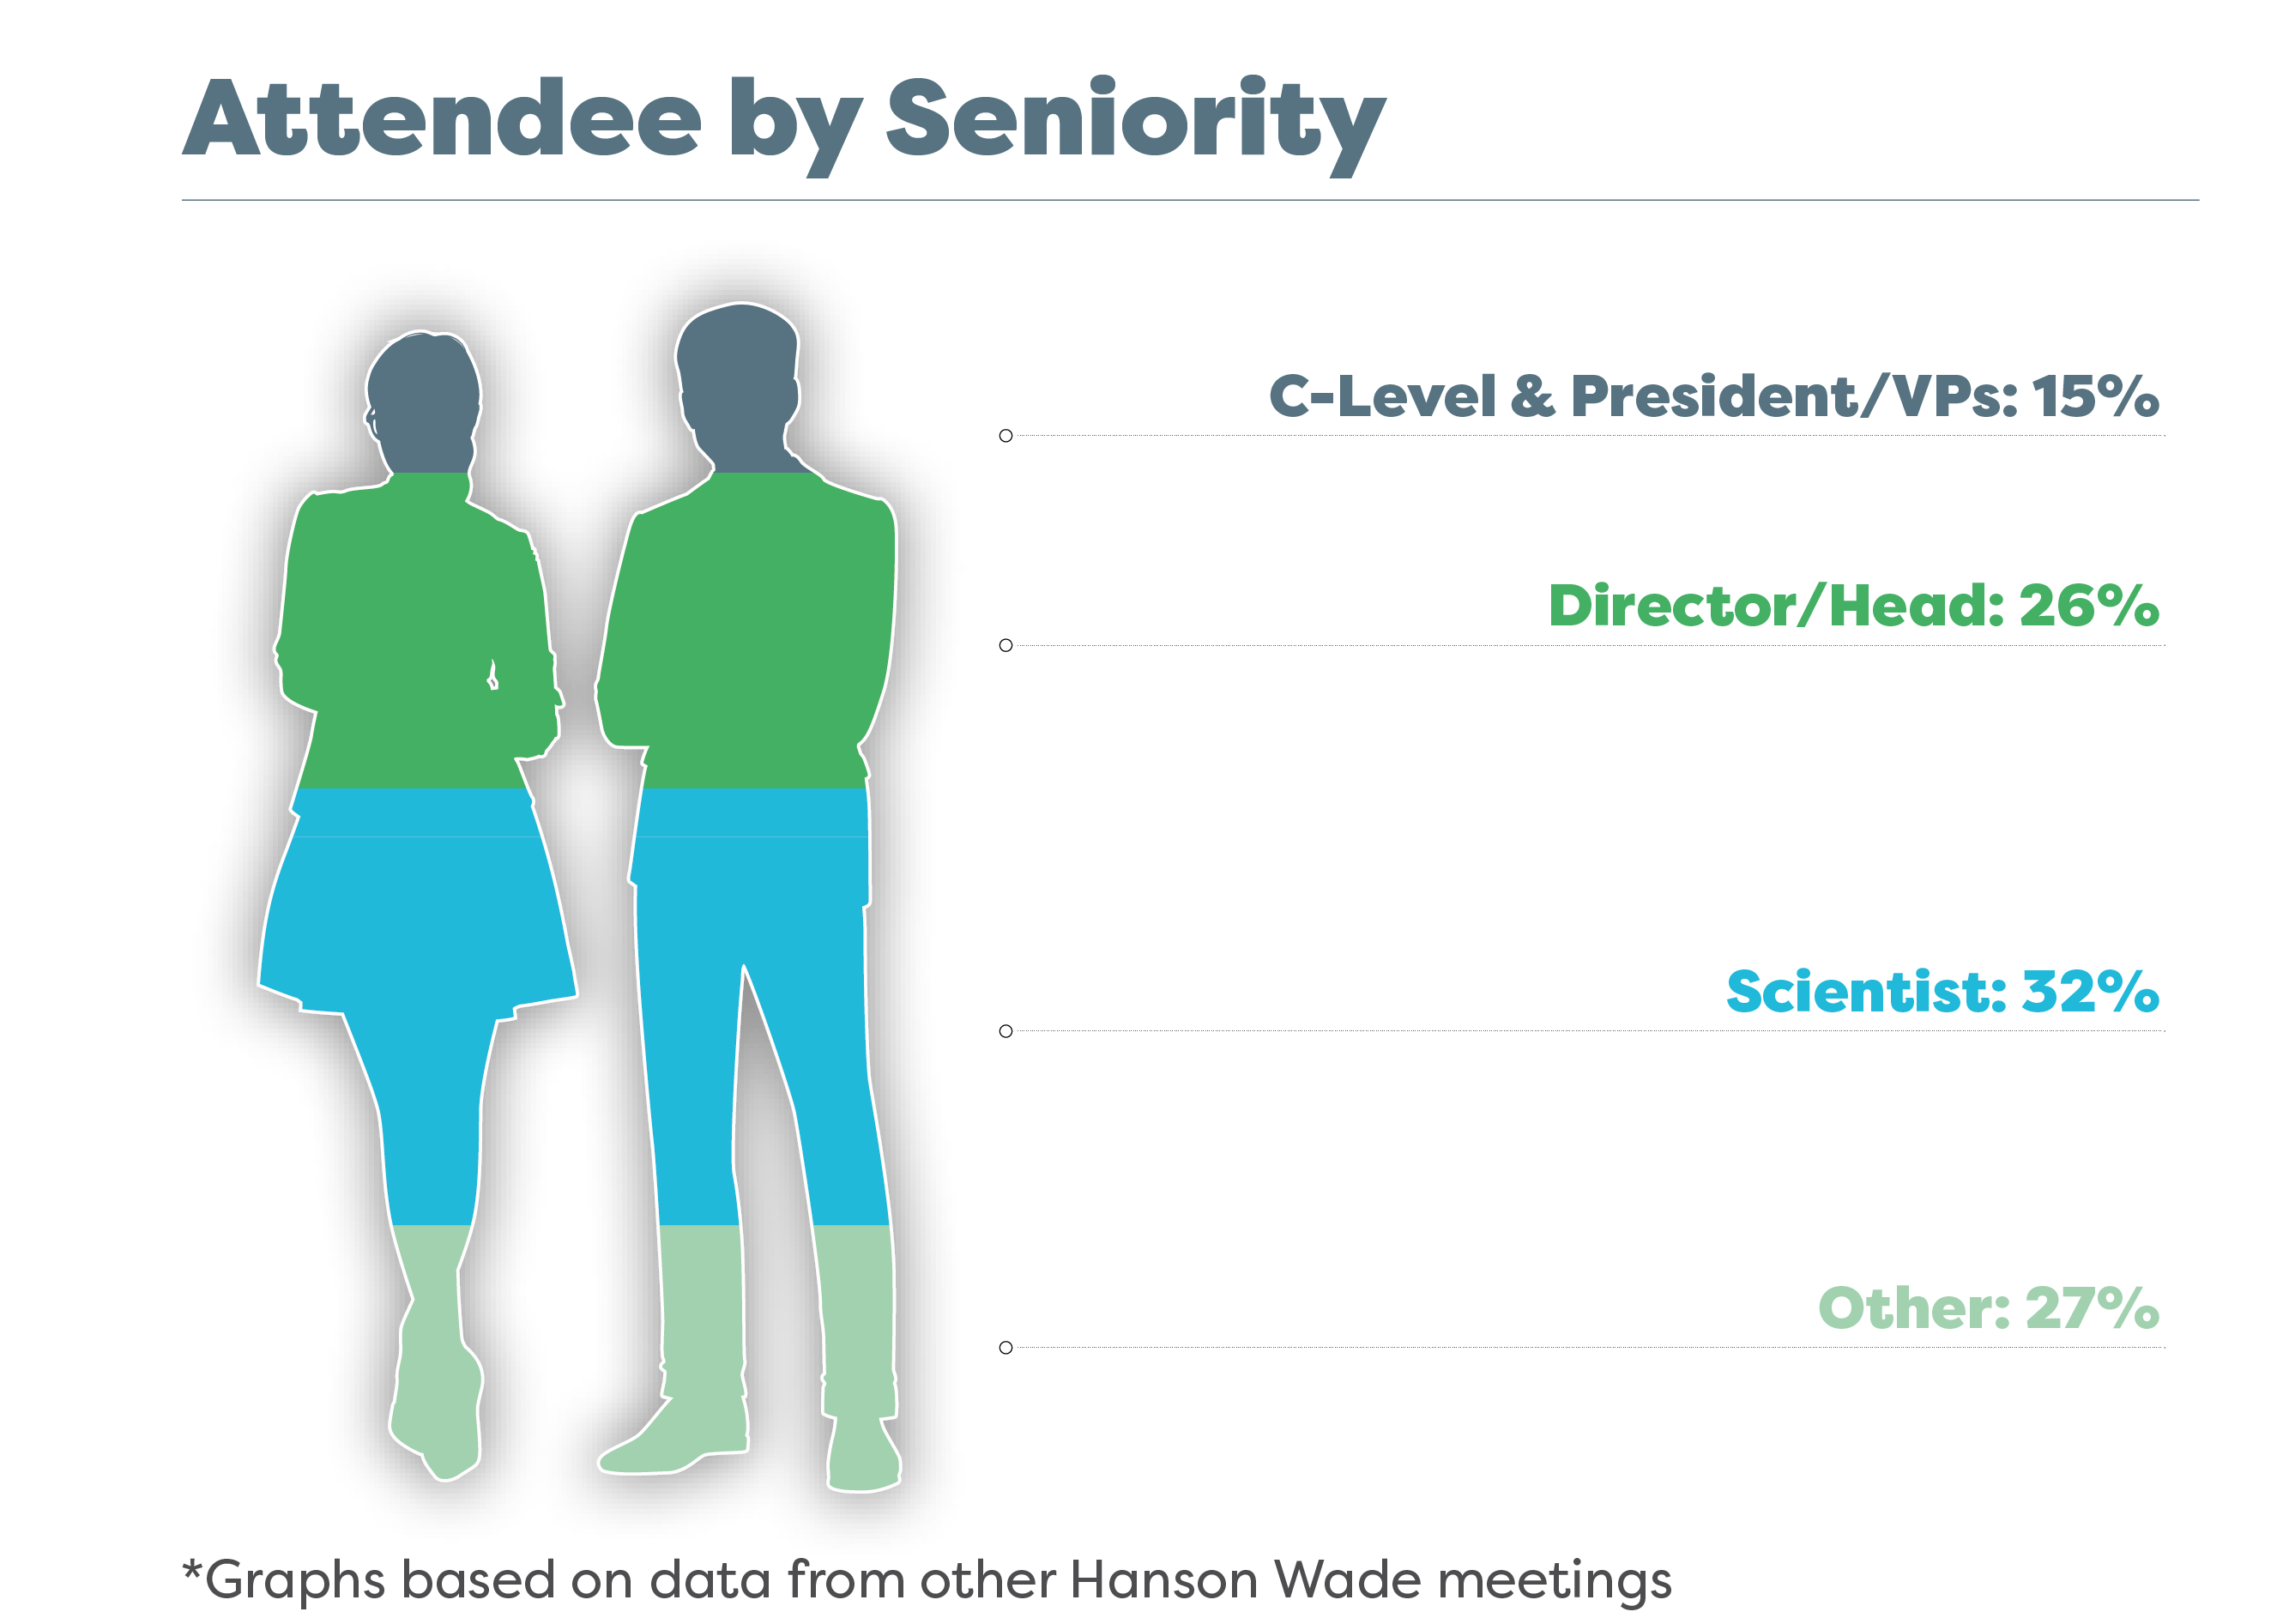 Attendee by seniority